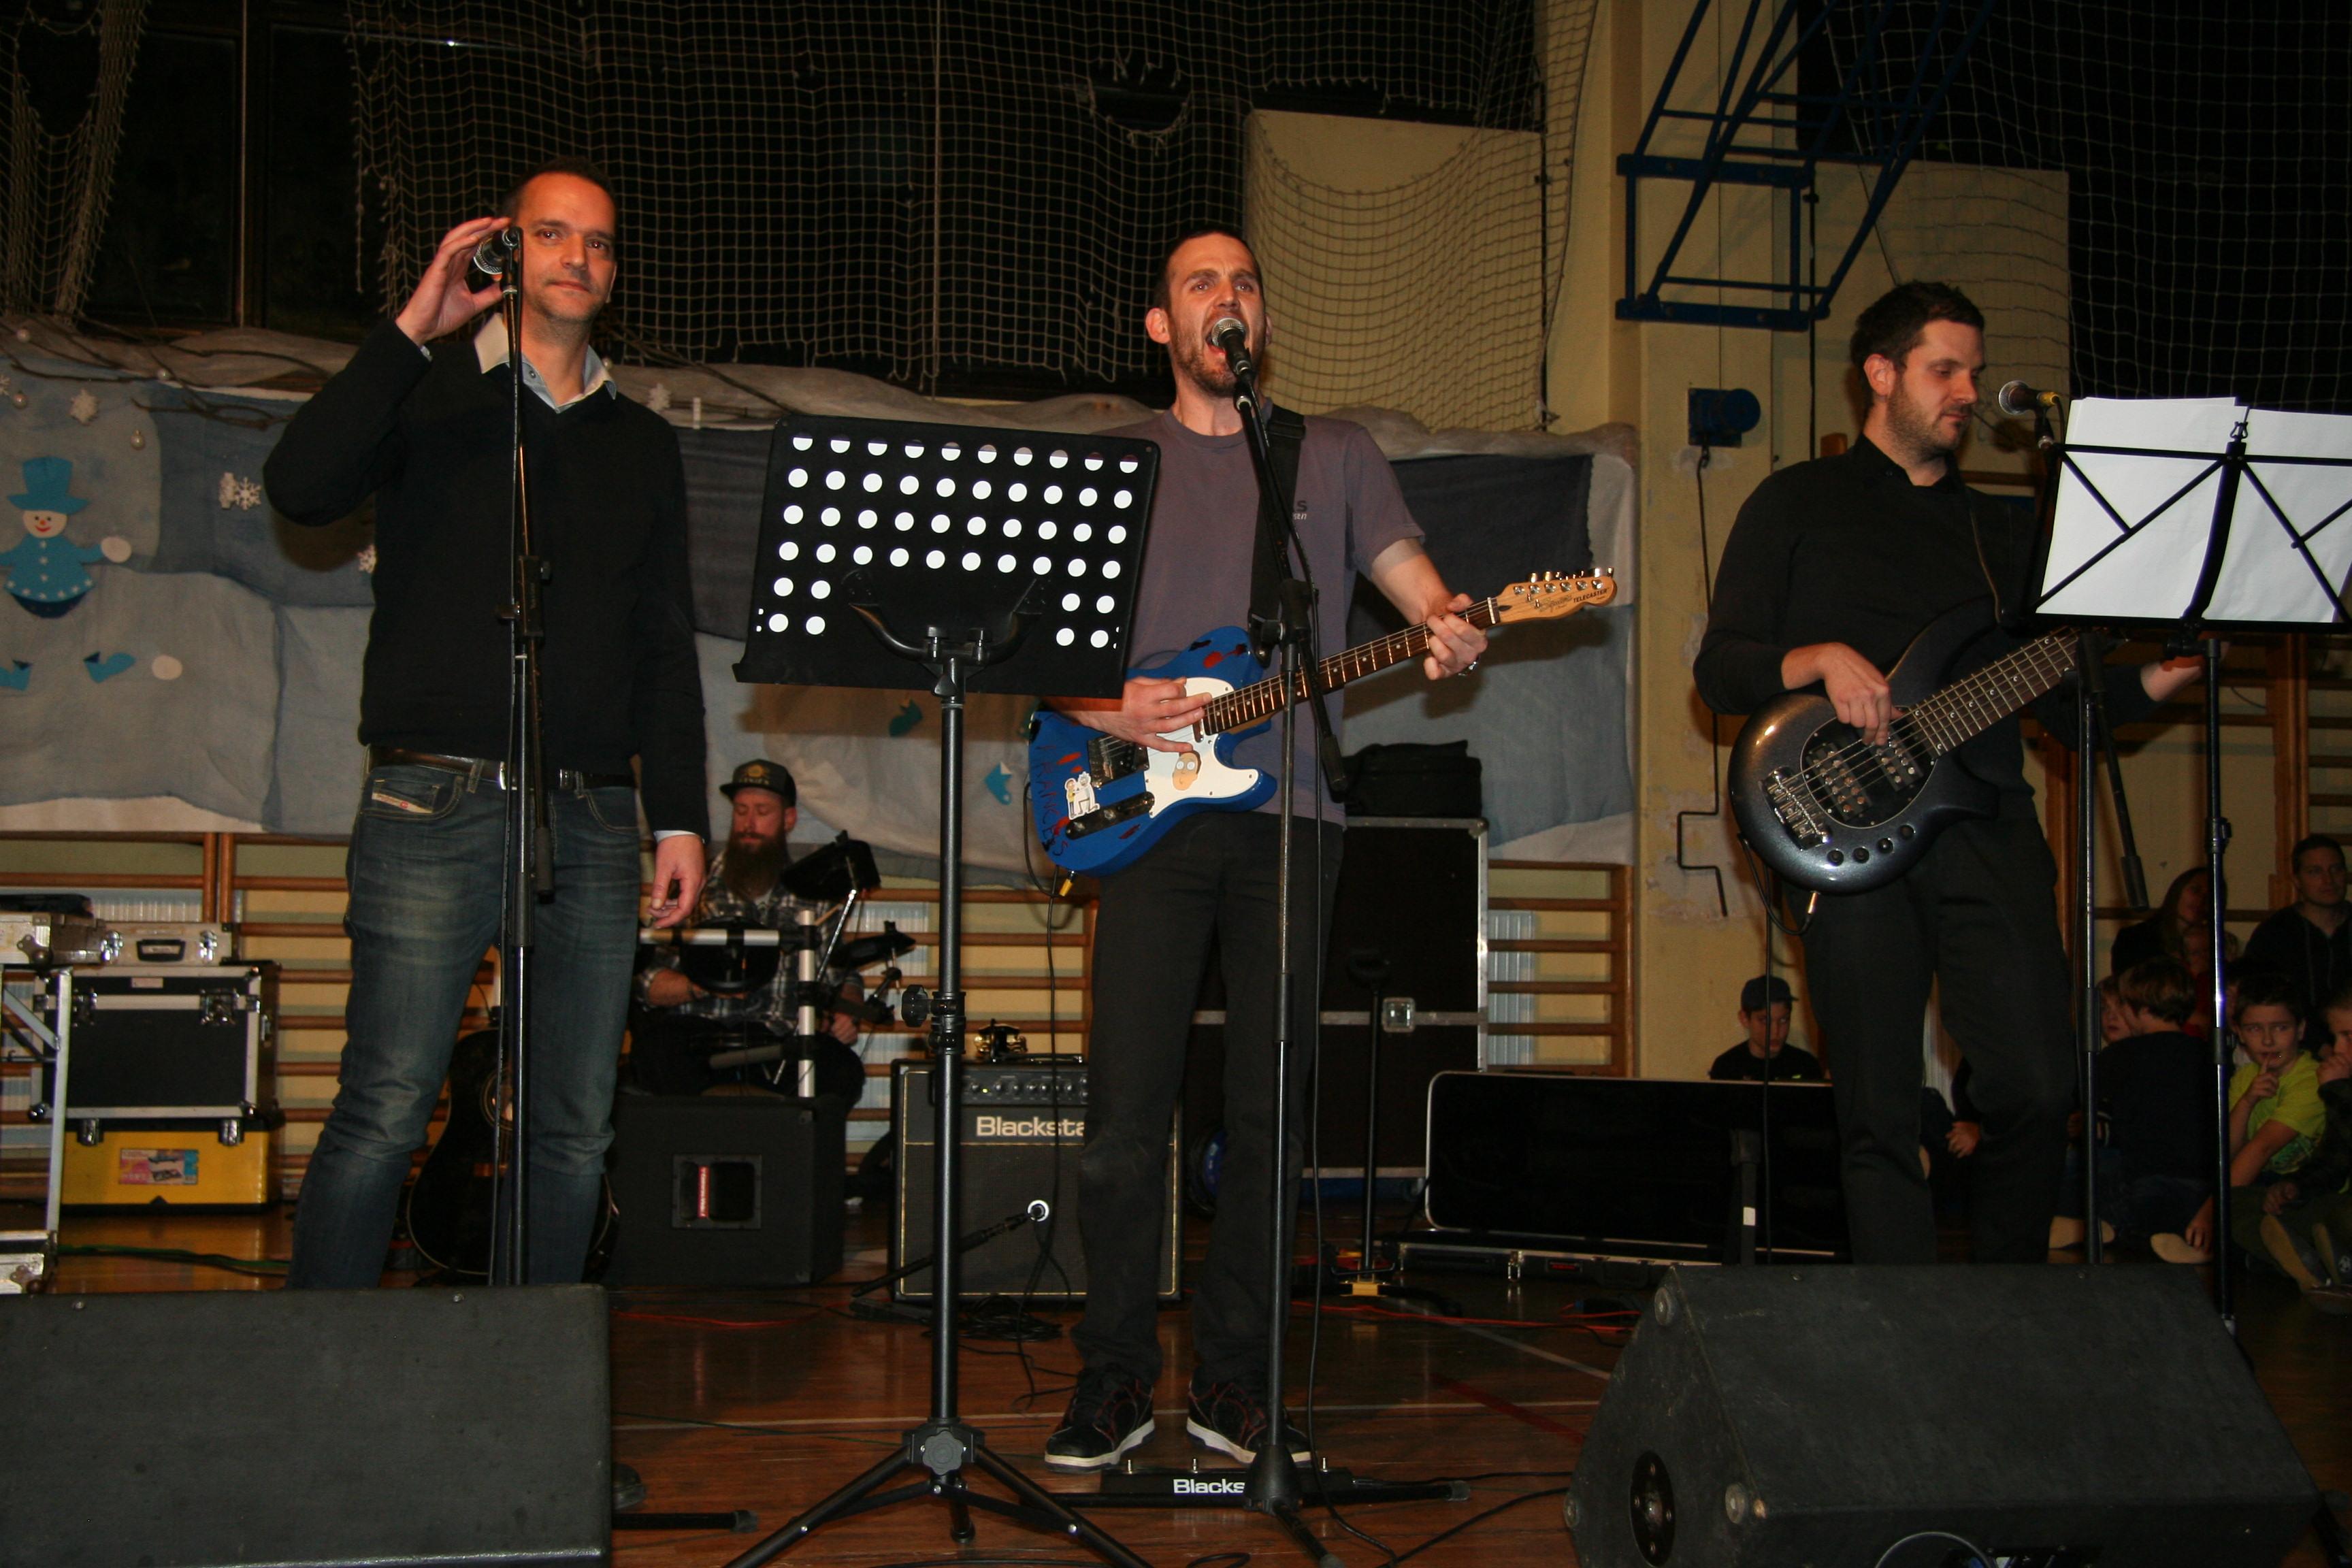 novoletno_humanitarni-koncert-2019-224